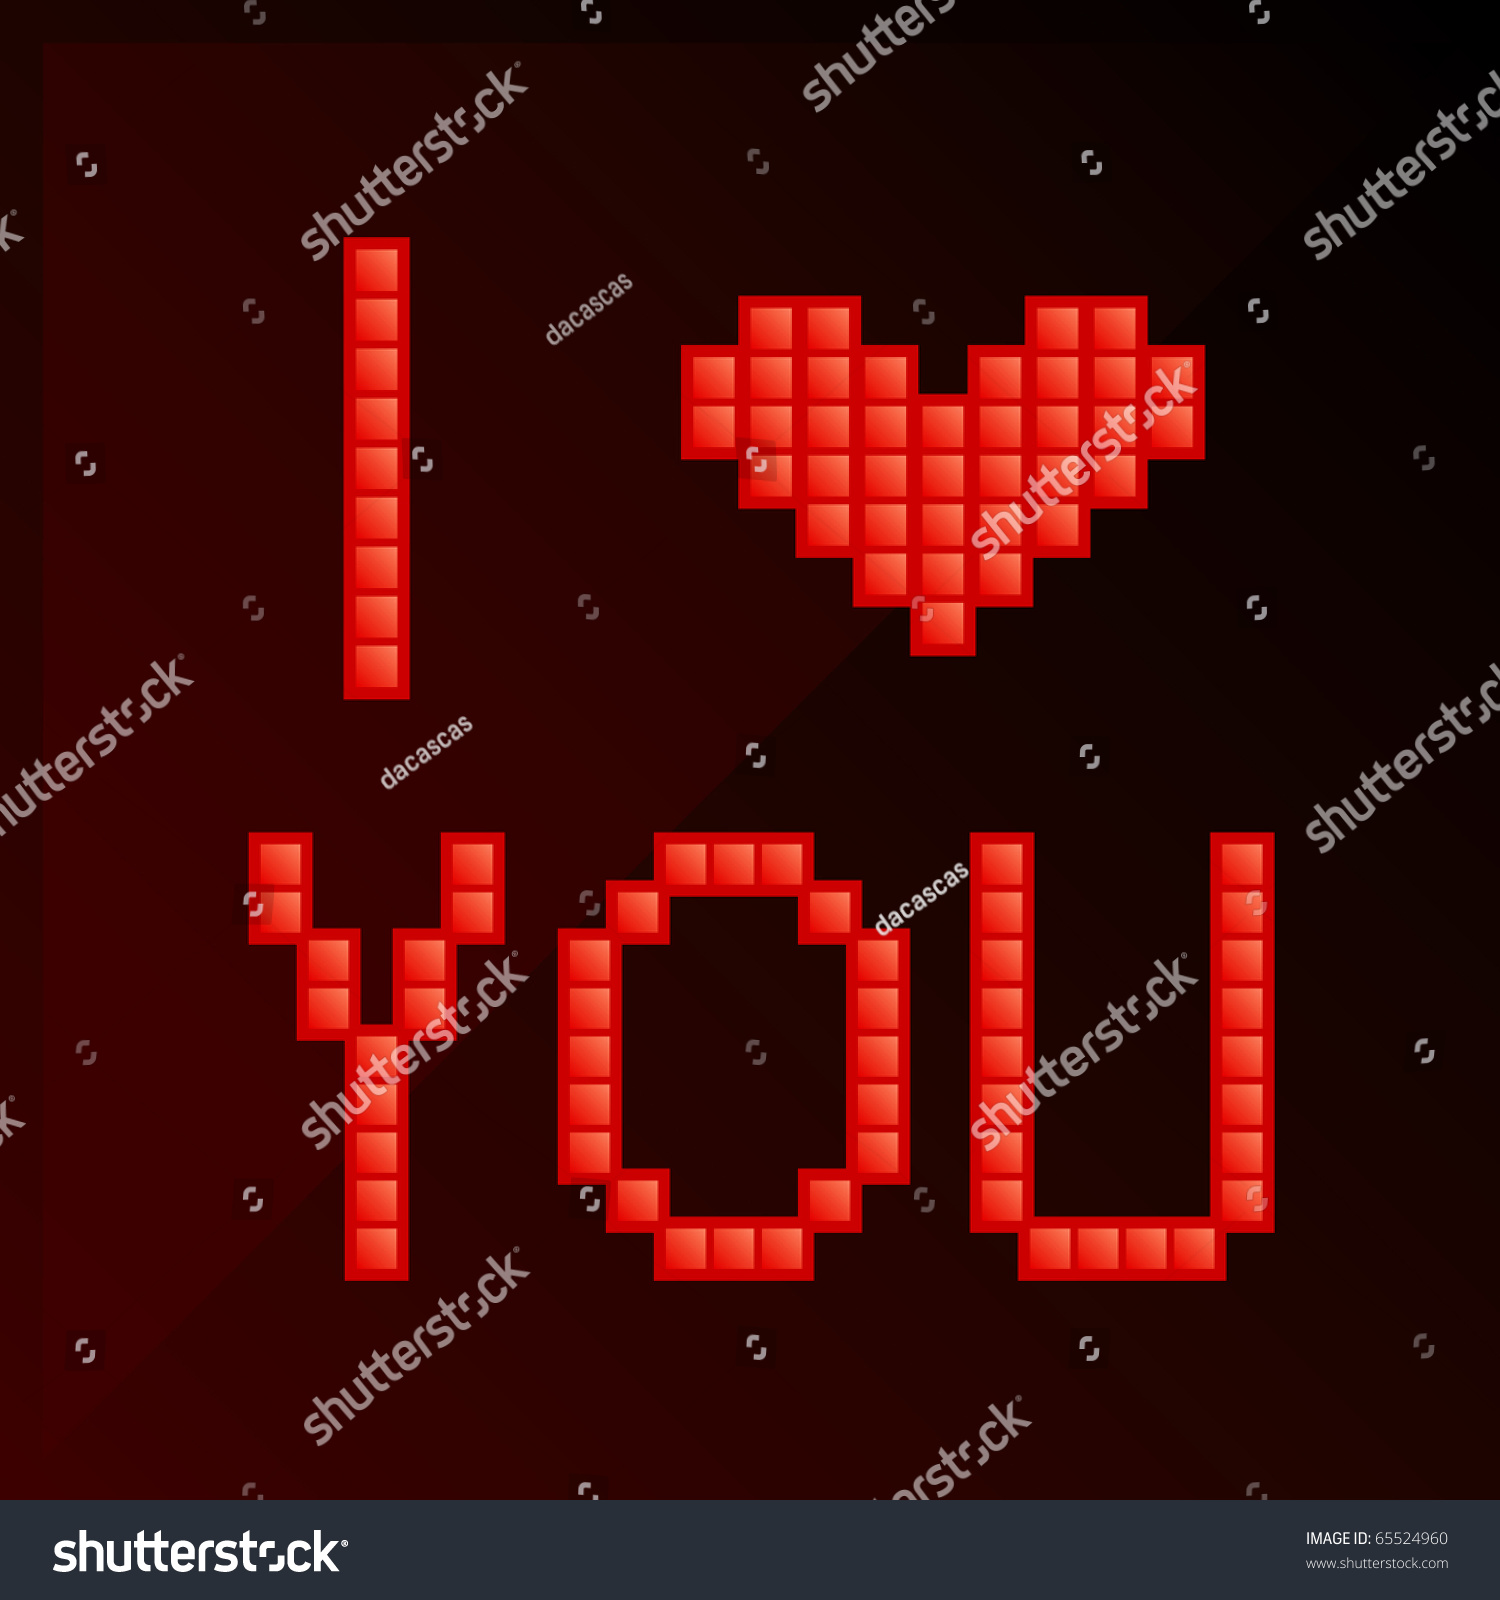 Pixel Art I Love You